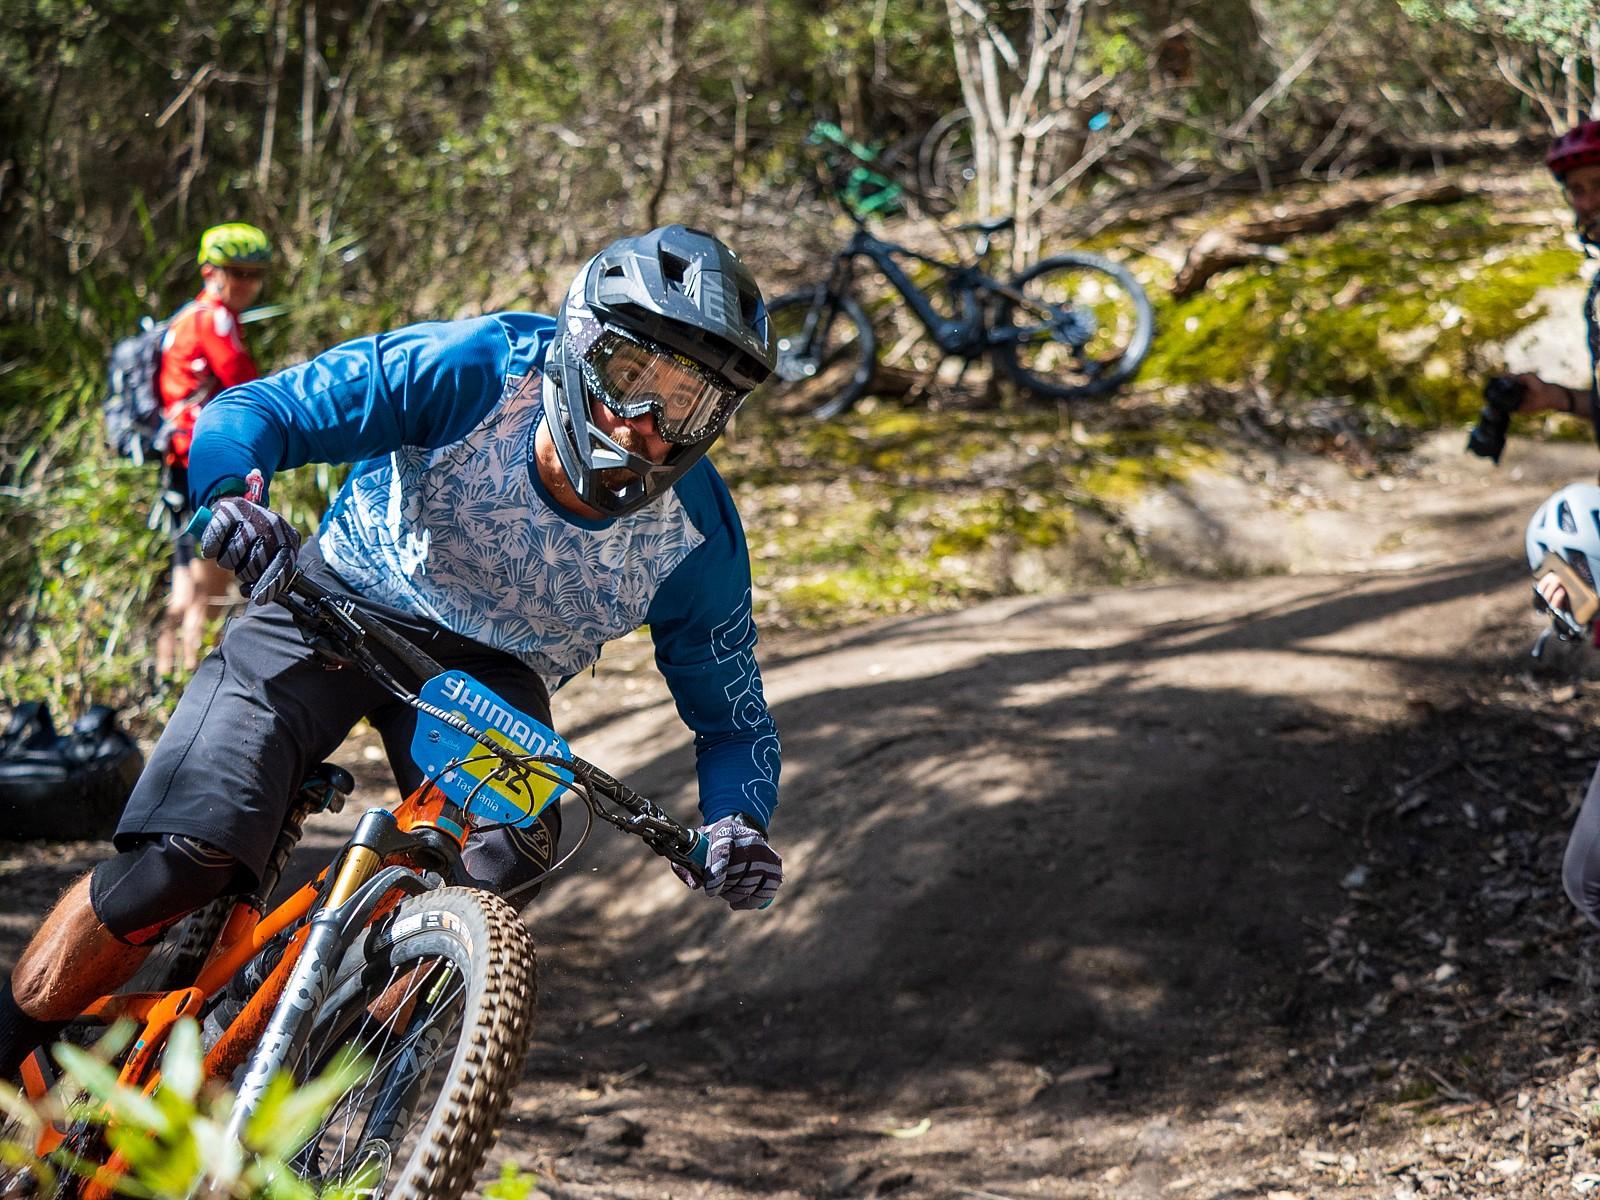 171119-Tassie-0575 - jack.fletcher86 - Mountain Biking Pictures - Vital MTB